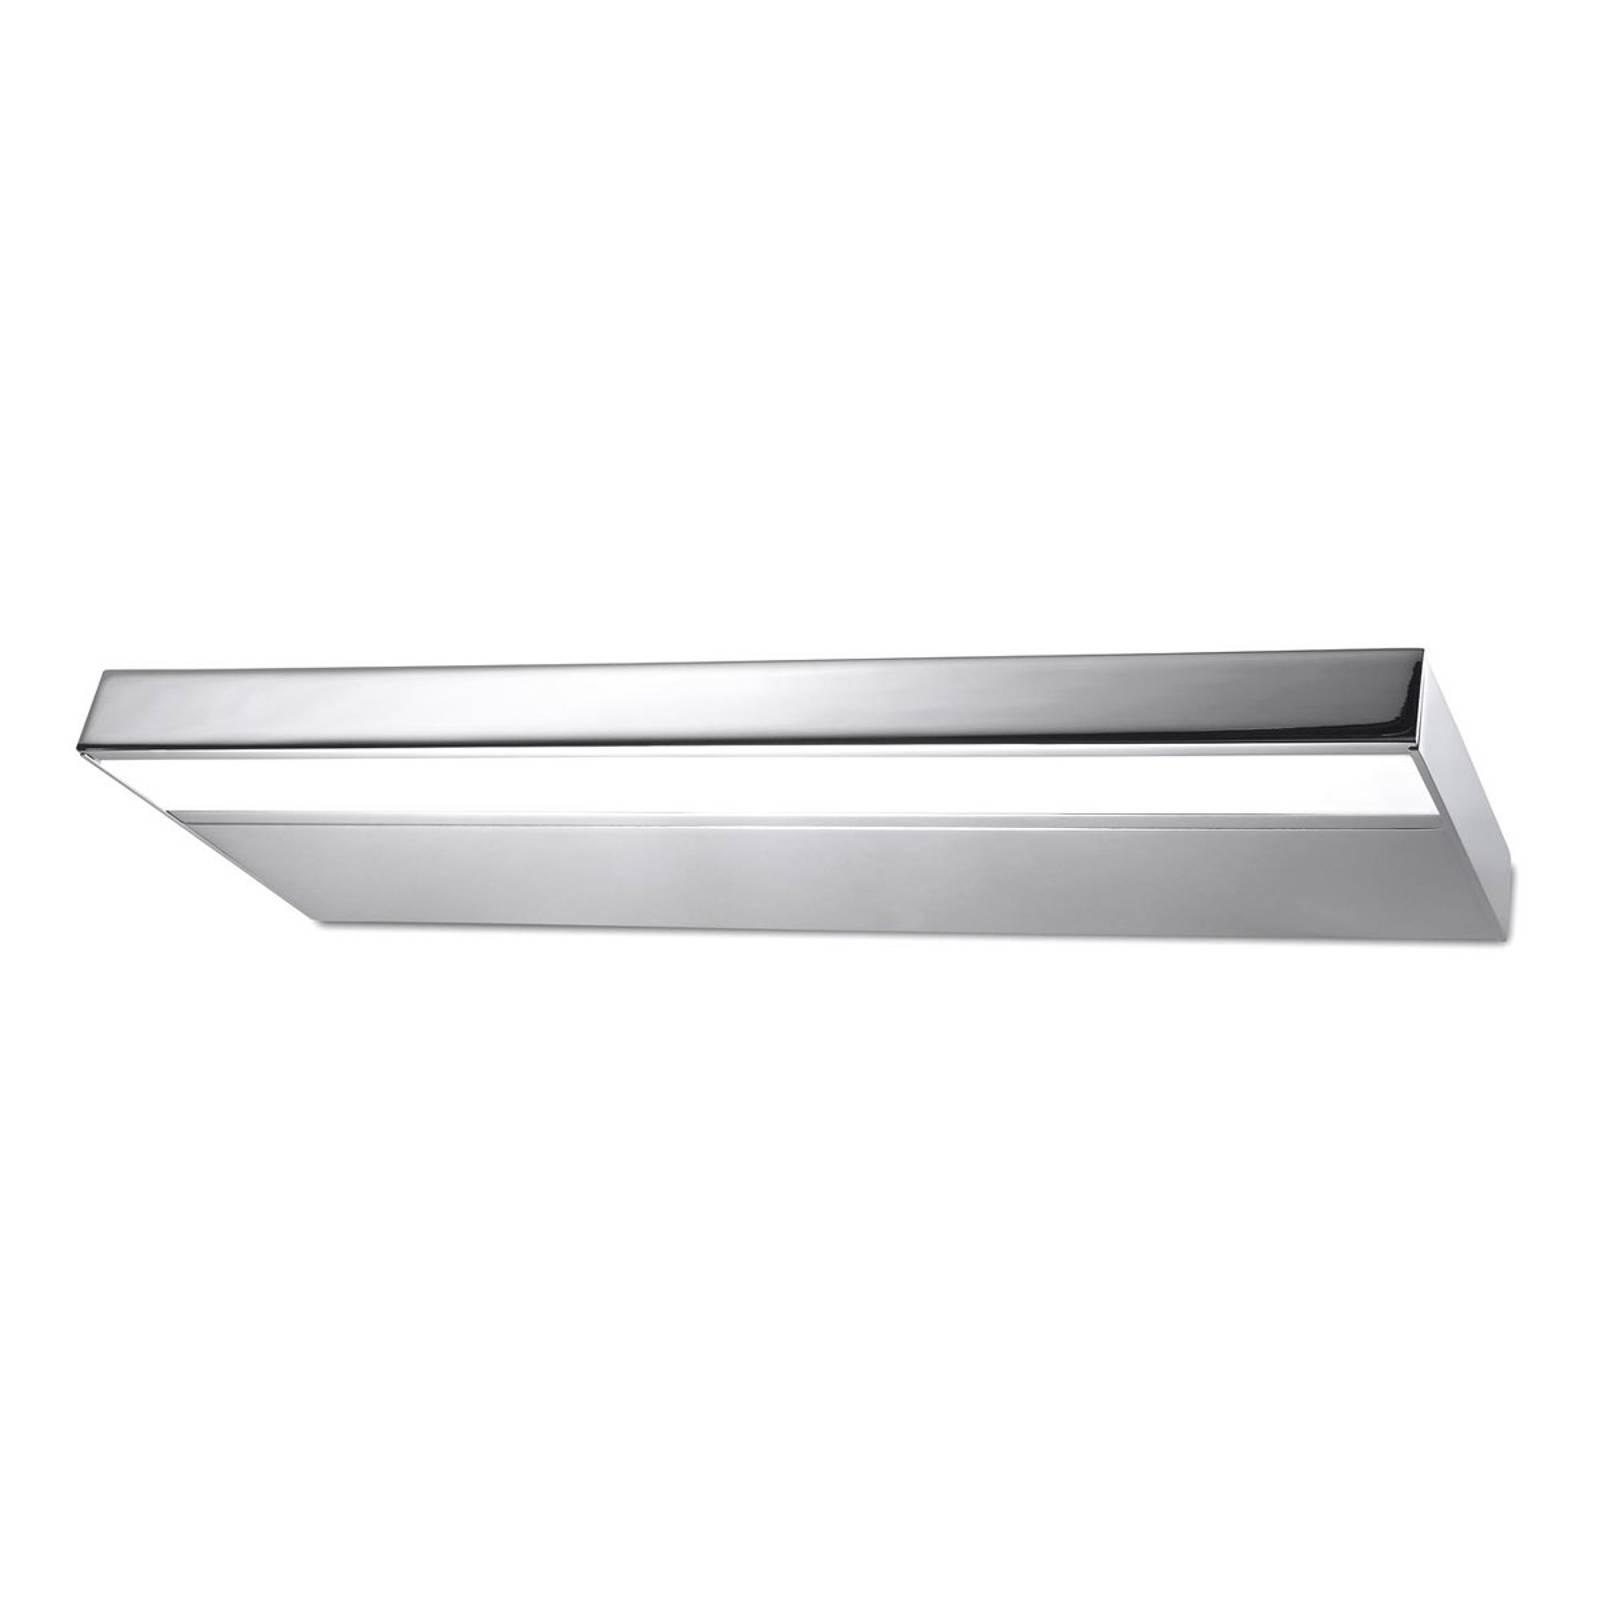 Kylpyhuoneen LED-seinälamppu Prim 60cm, kromi